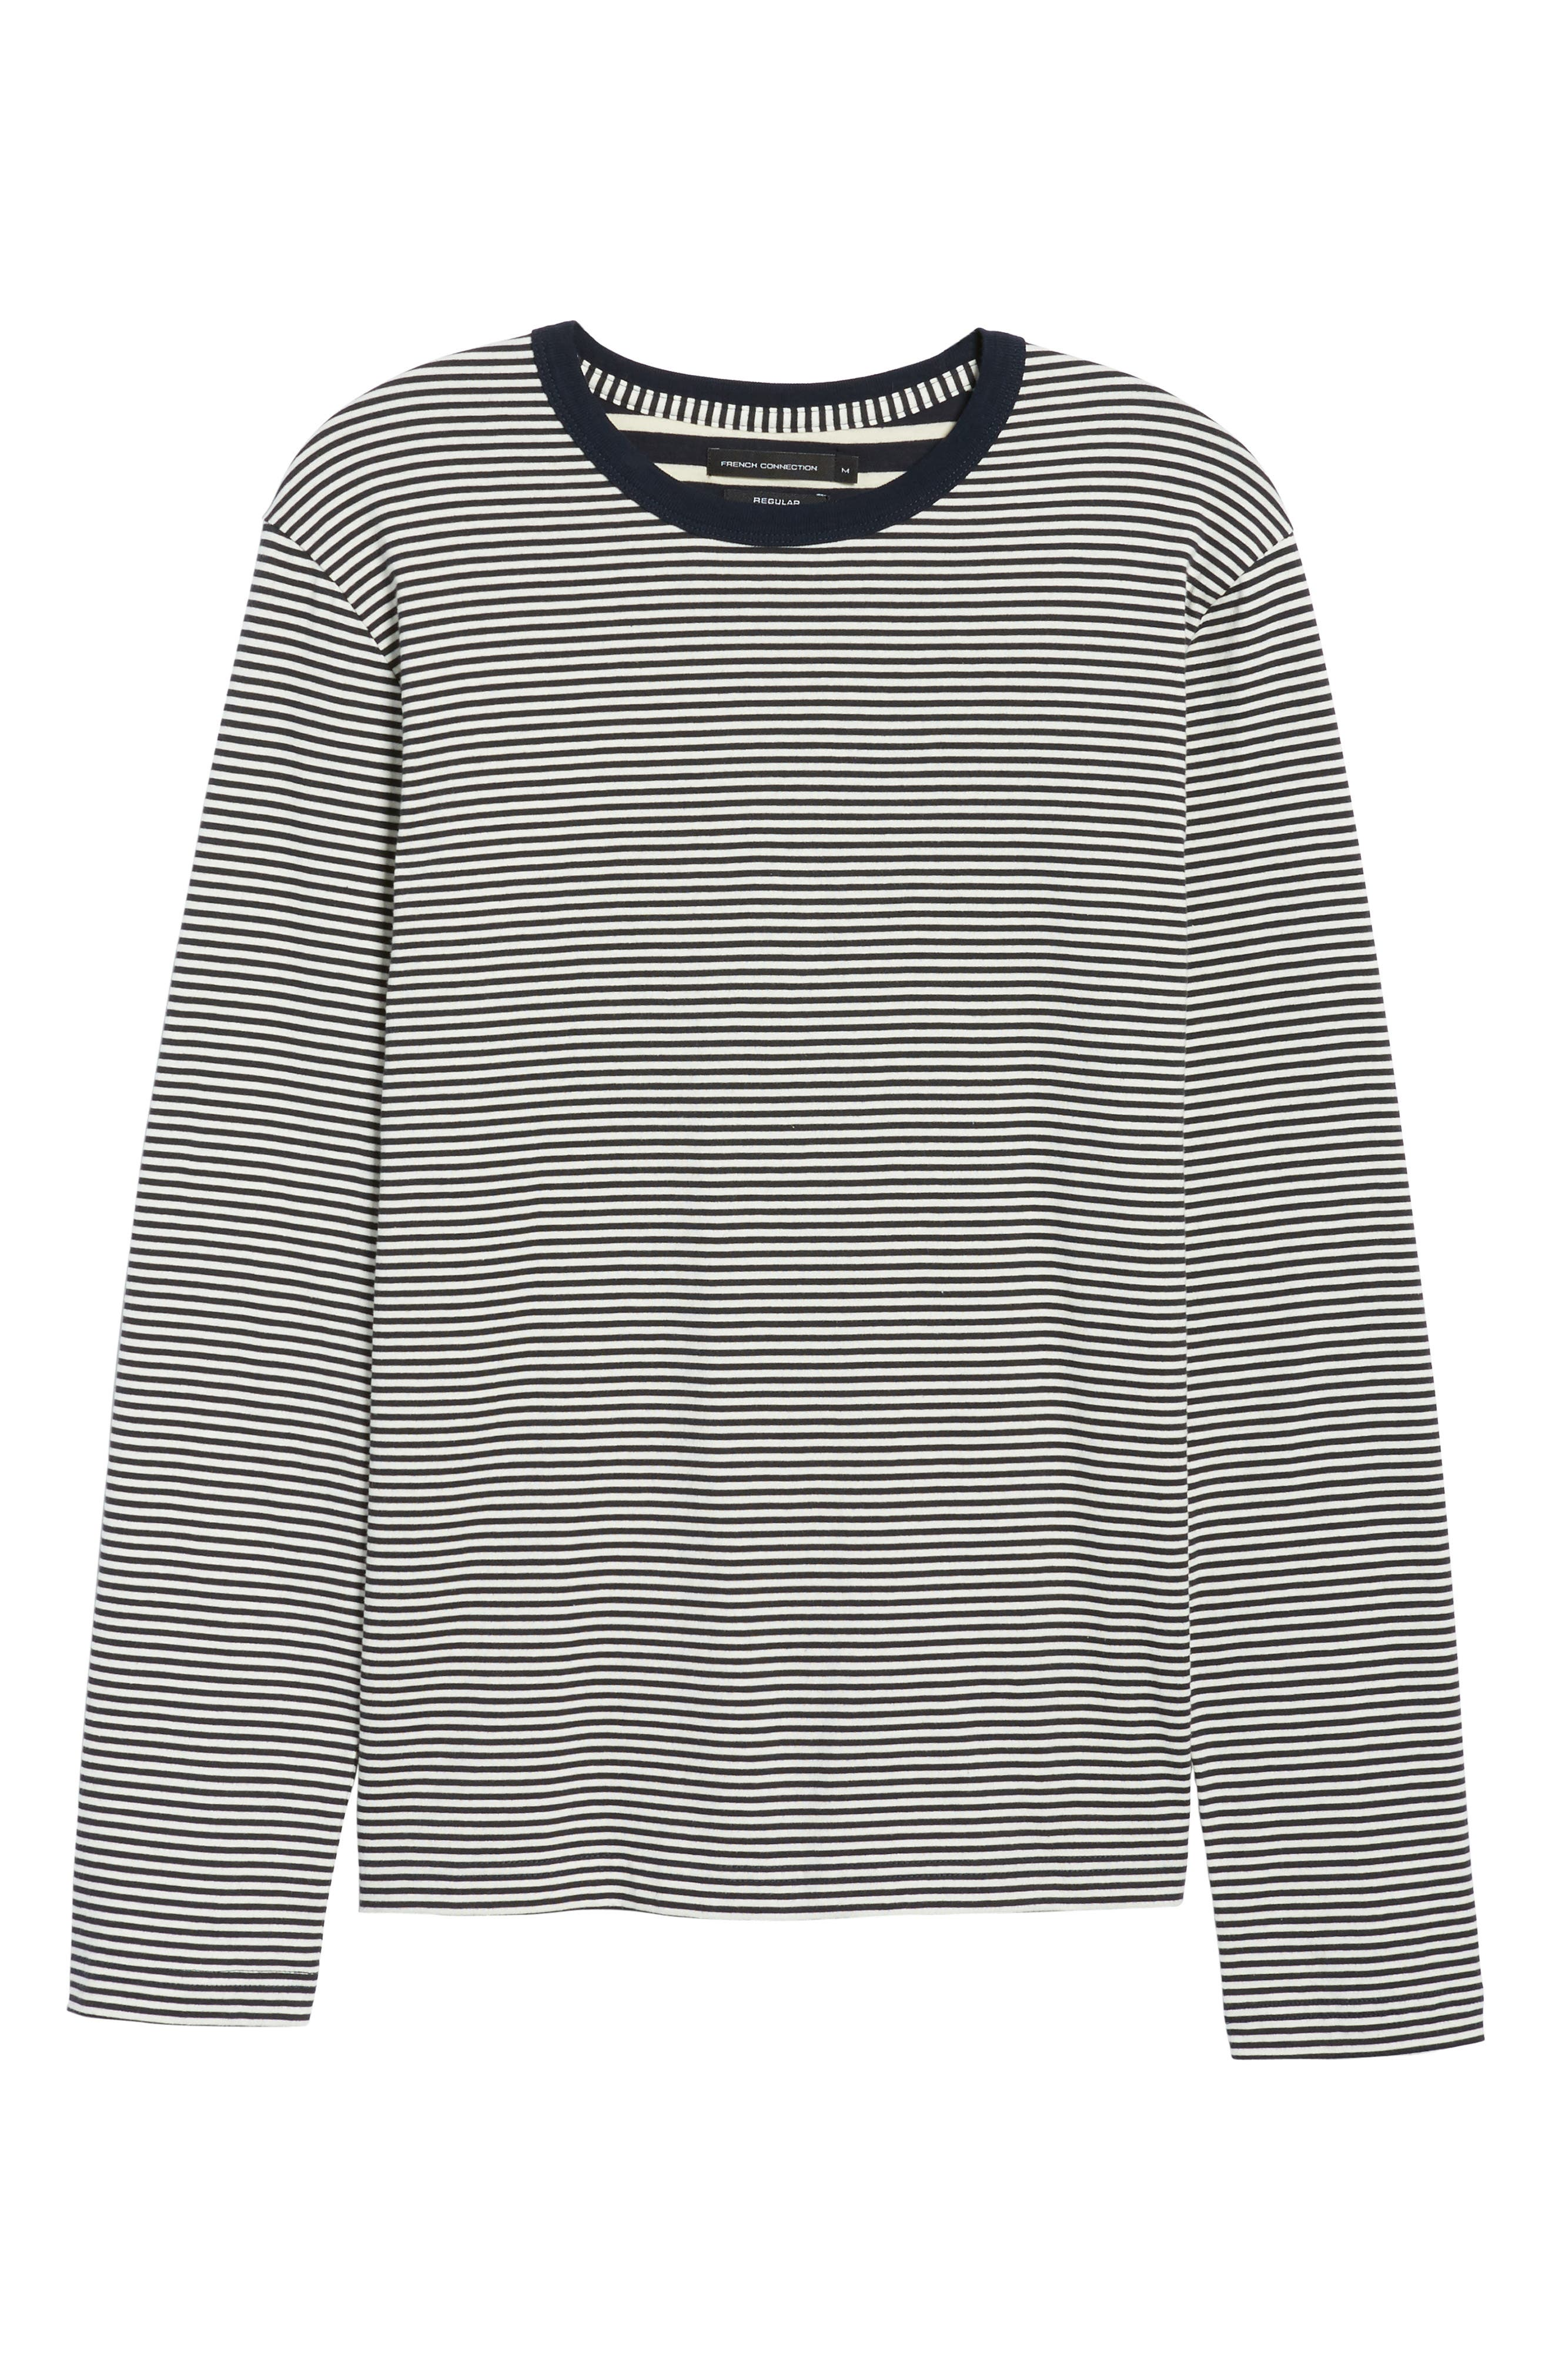 Mix Stripe Long Sleeve T-Shirt,                             Alternate thumbnail 6, color,                             020